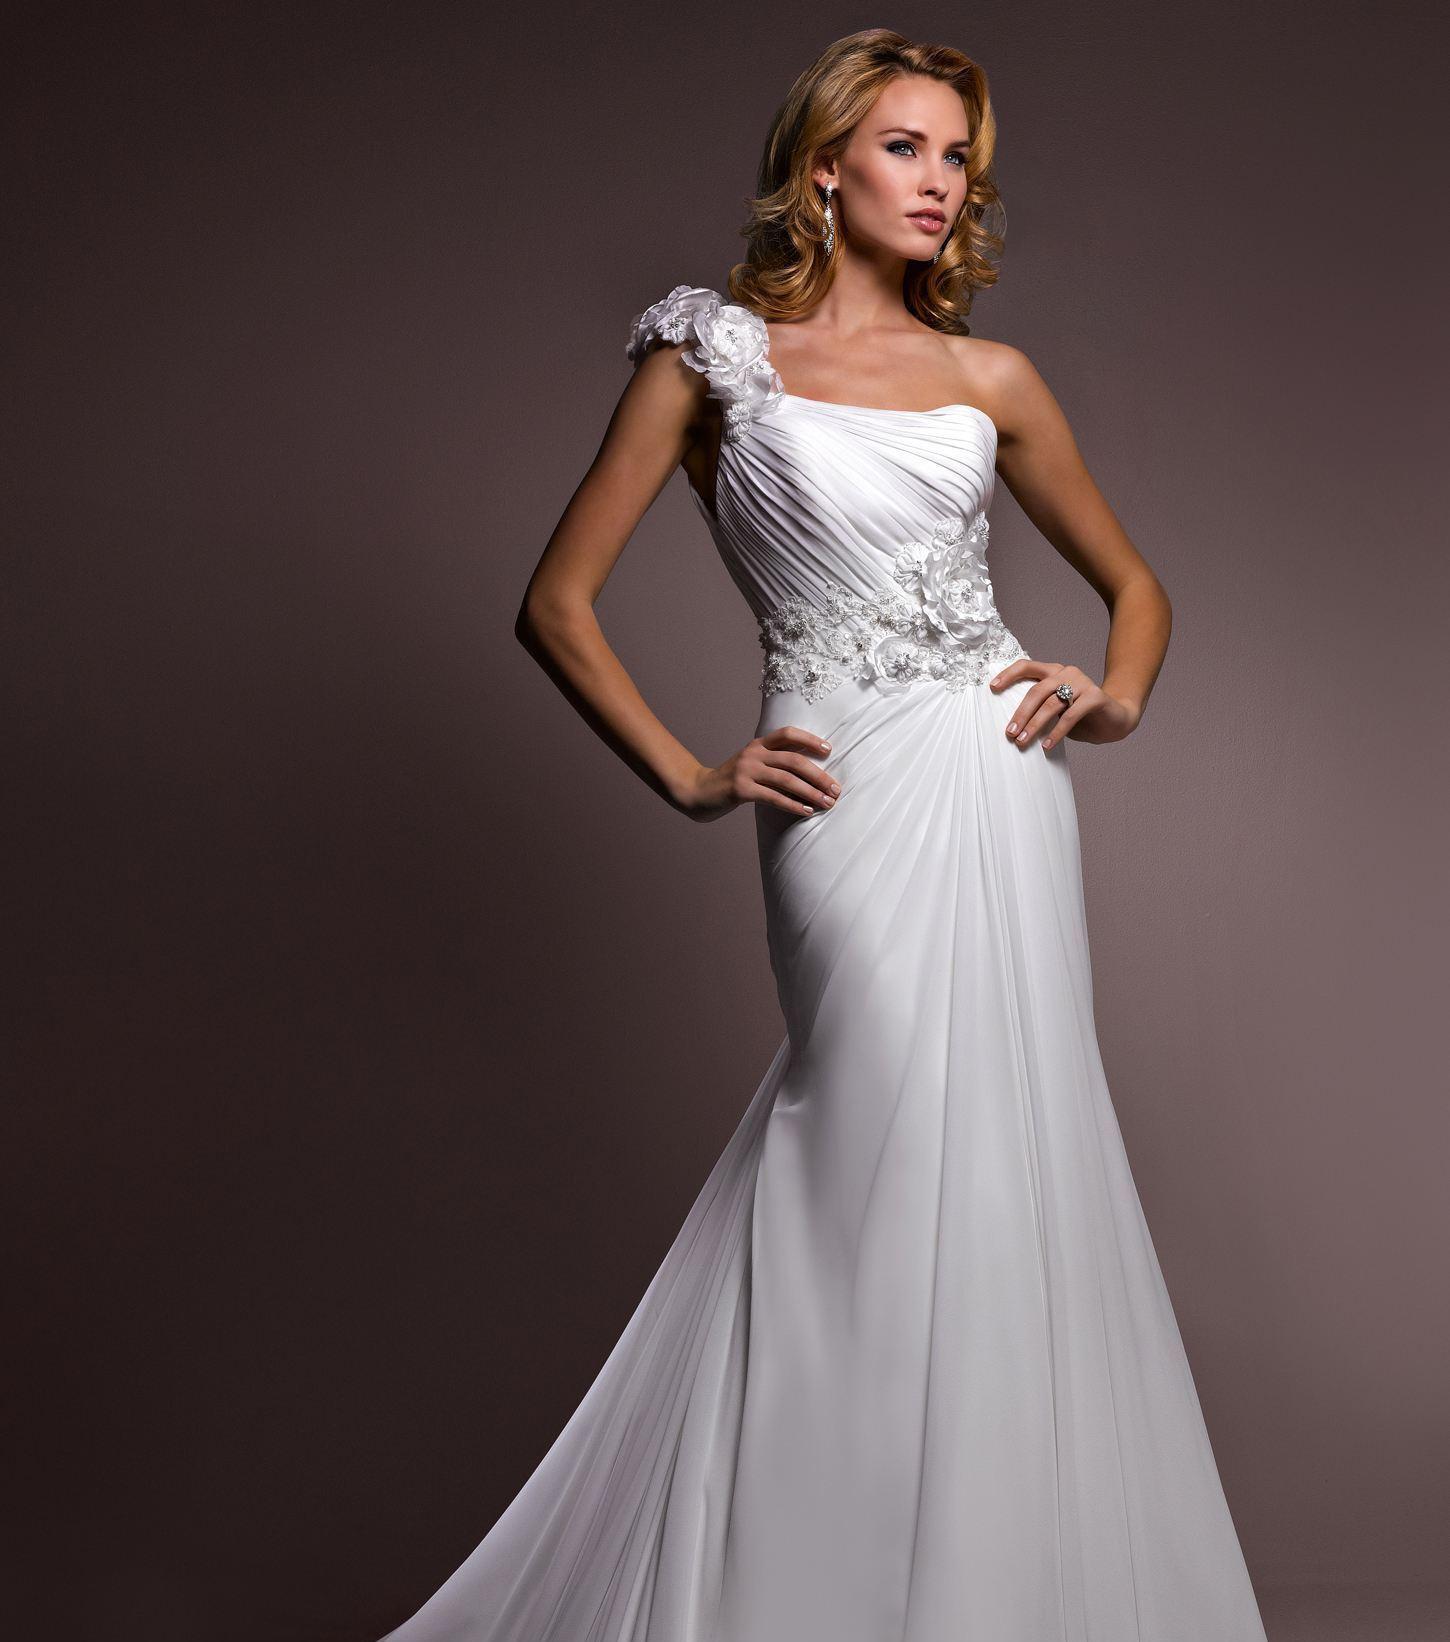 Wedding Gowns Austin Tx: Belle Saison Bridal-Austin Bridal